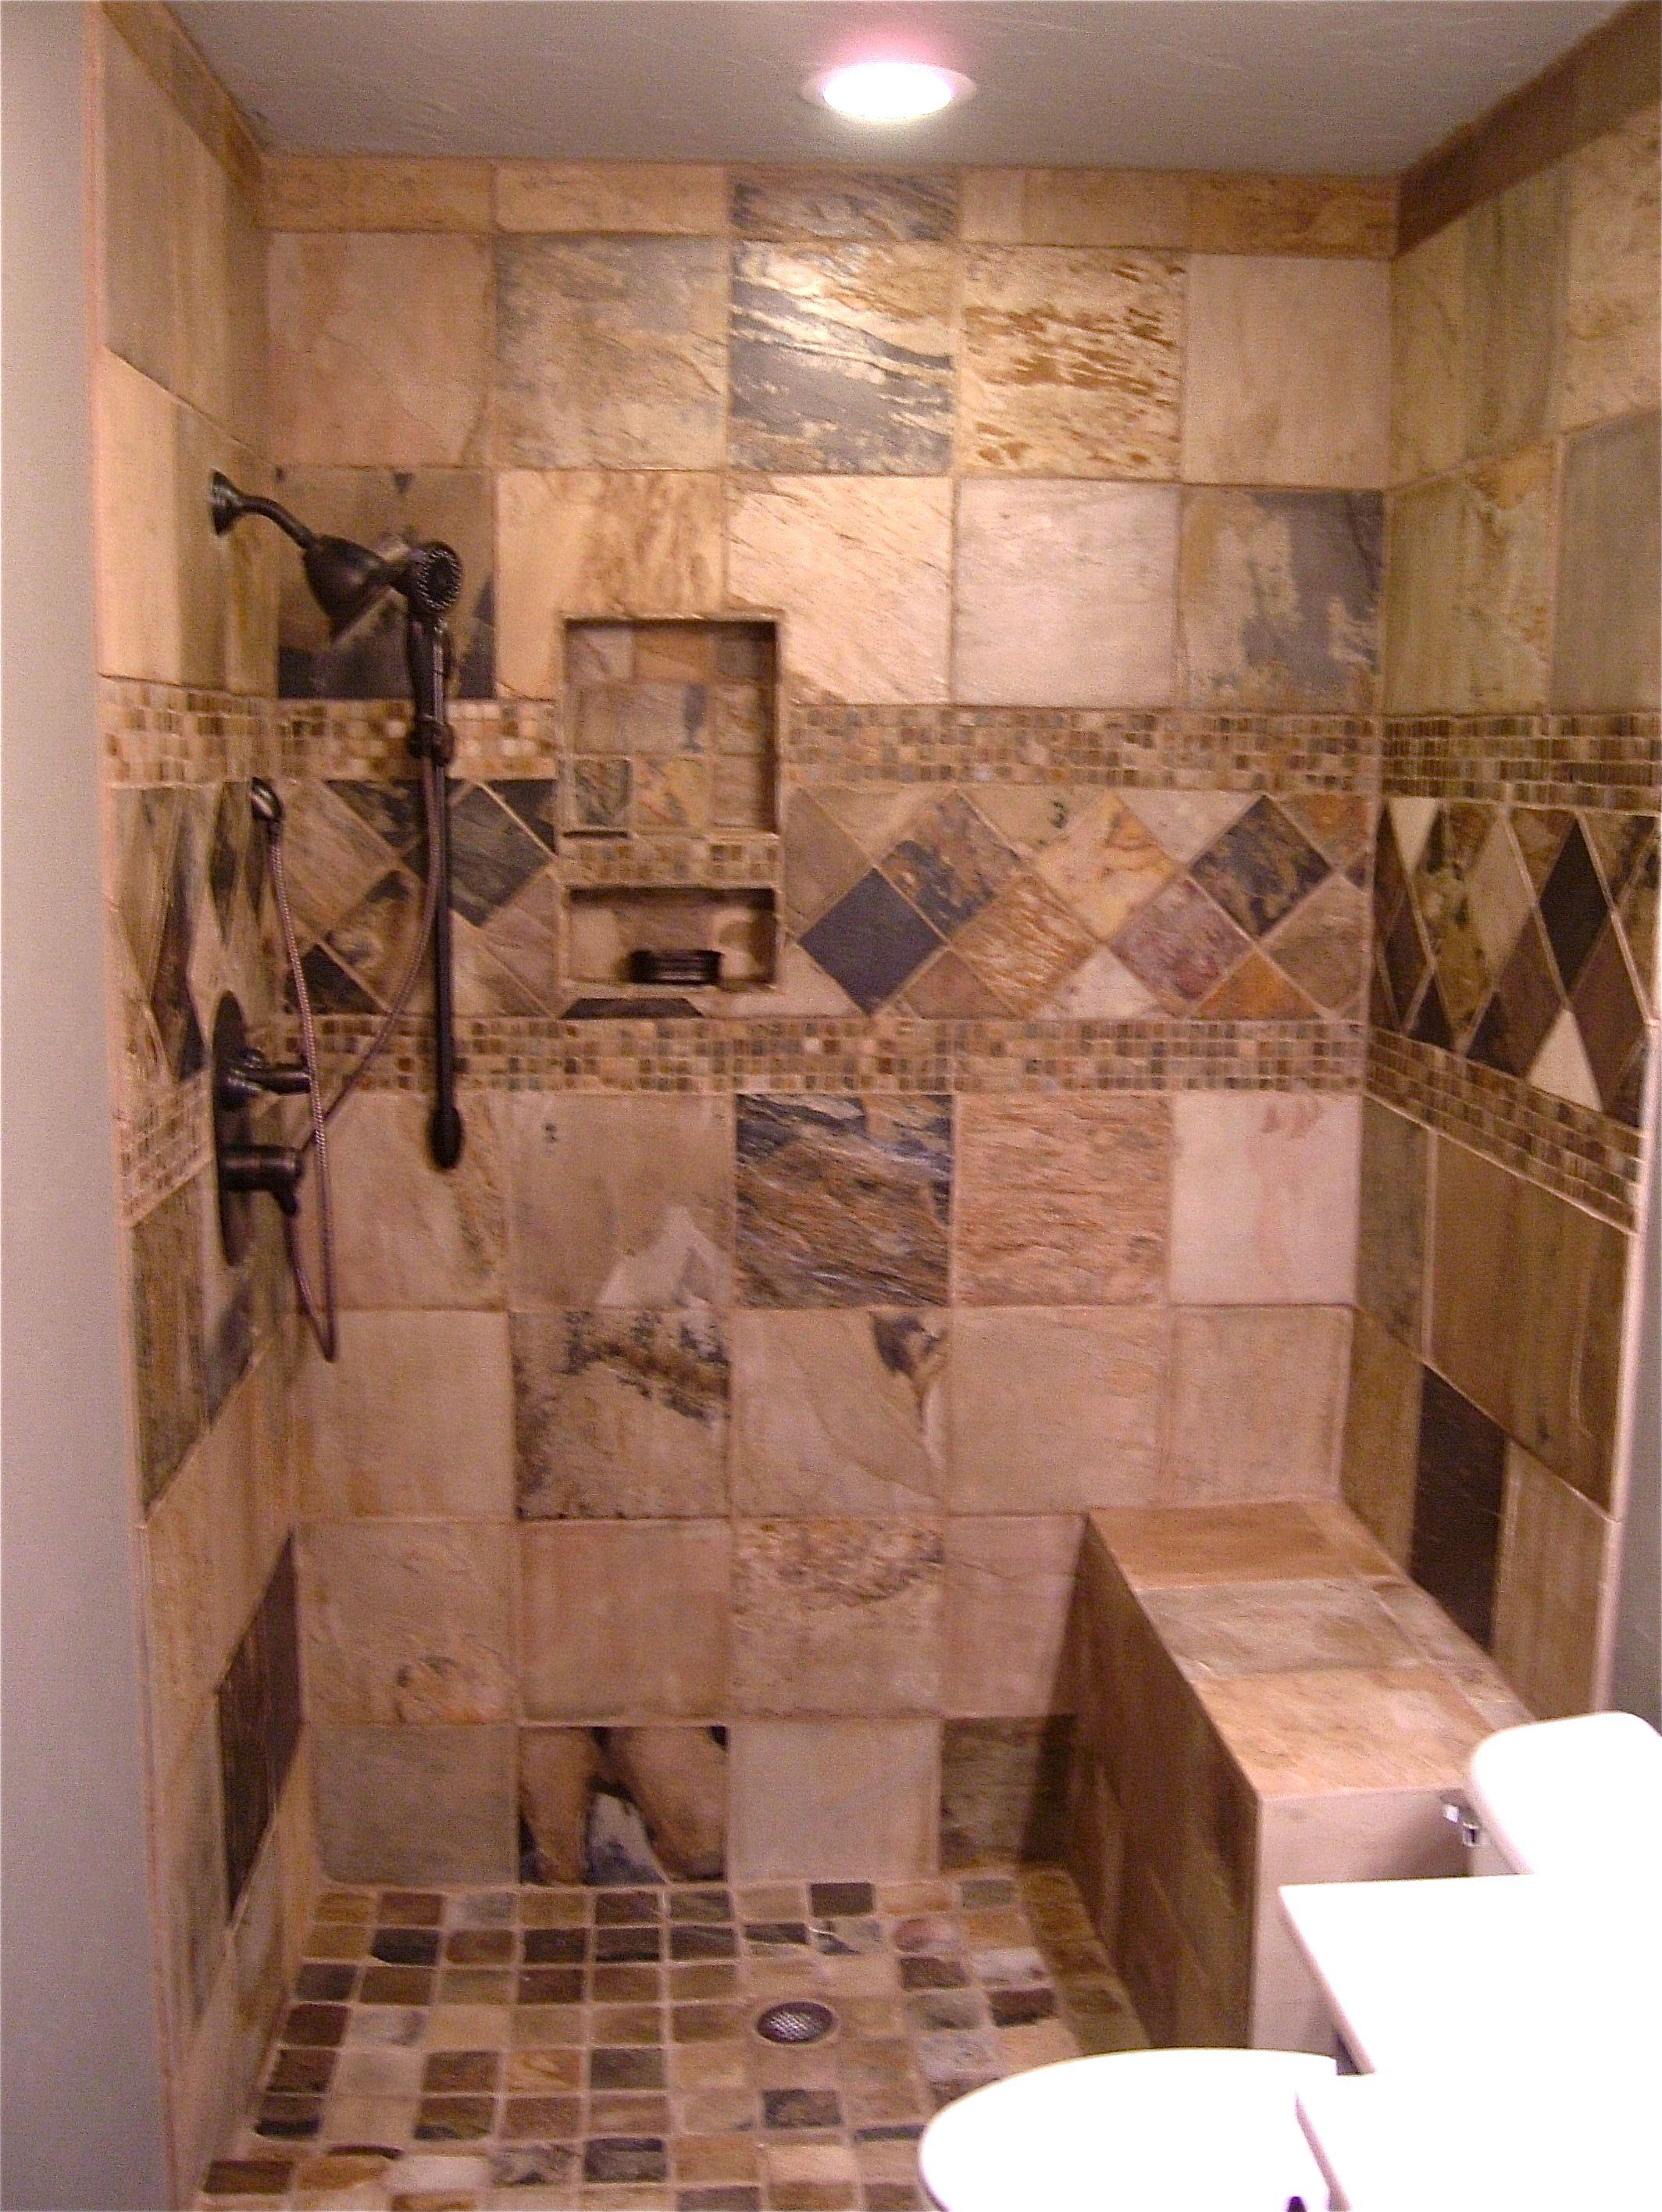 Bathroom Remodel Edmond Ok oklahoma city & edmond showers and backsplash: we call this one